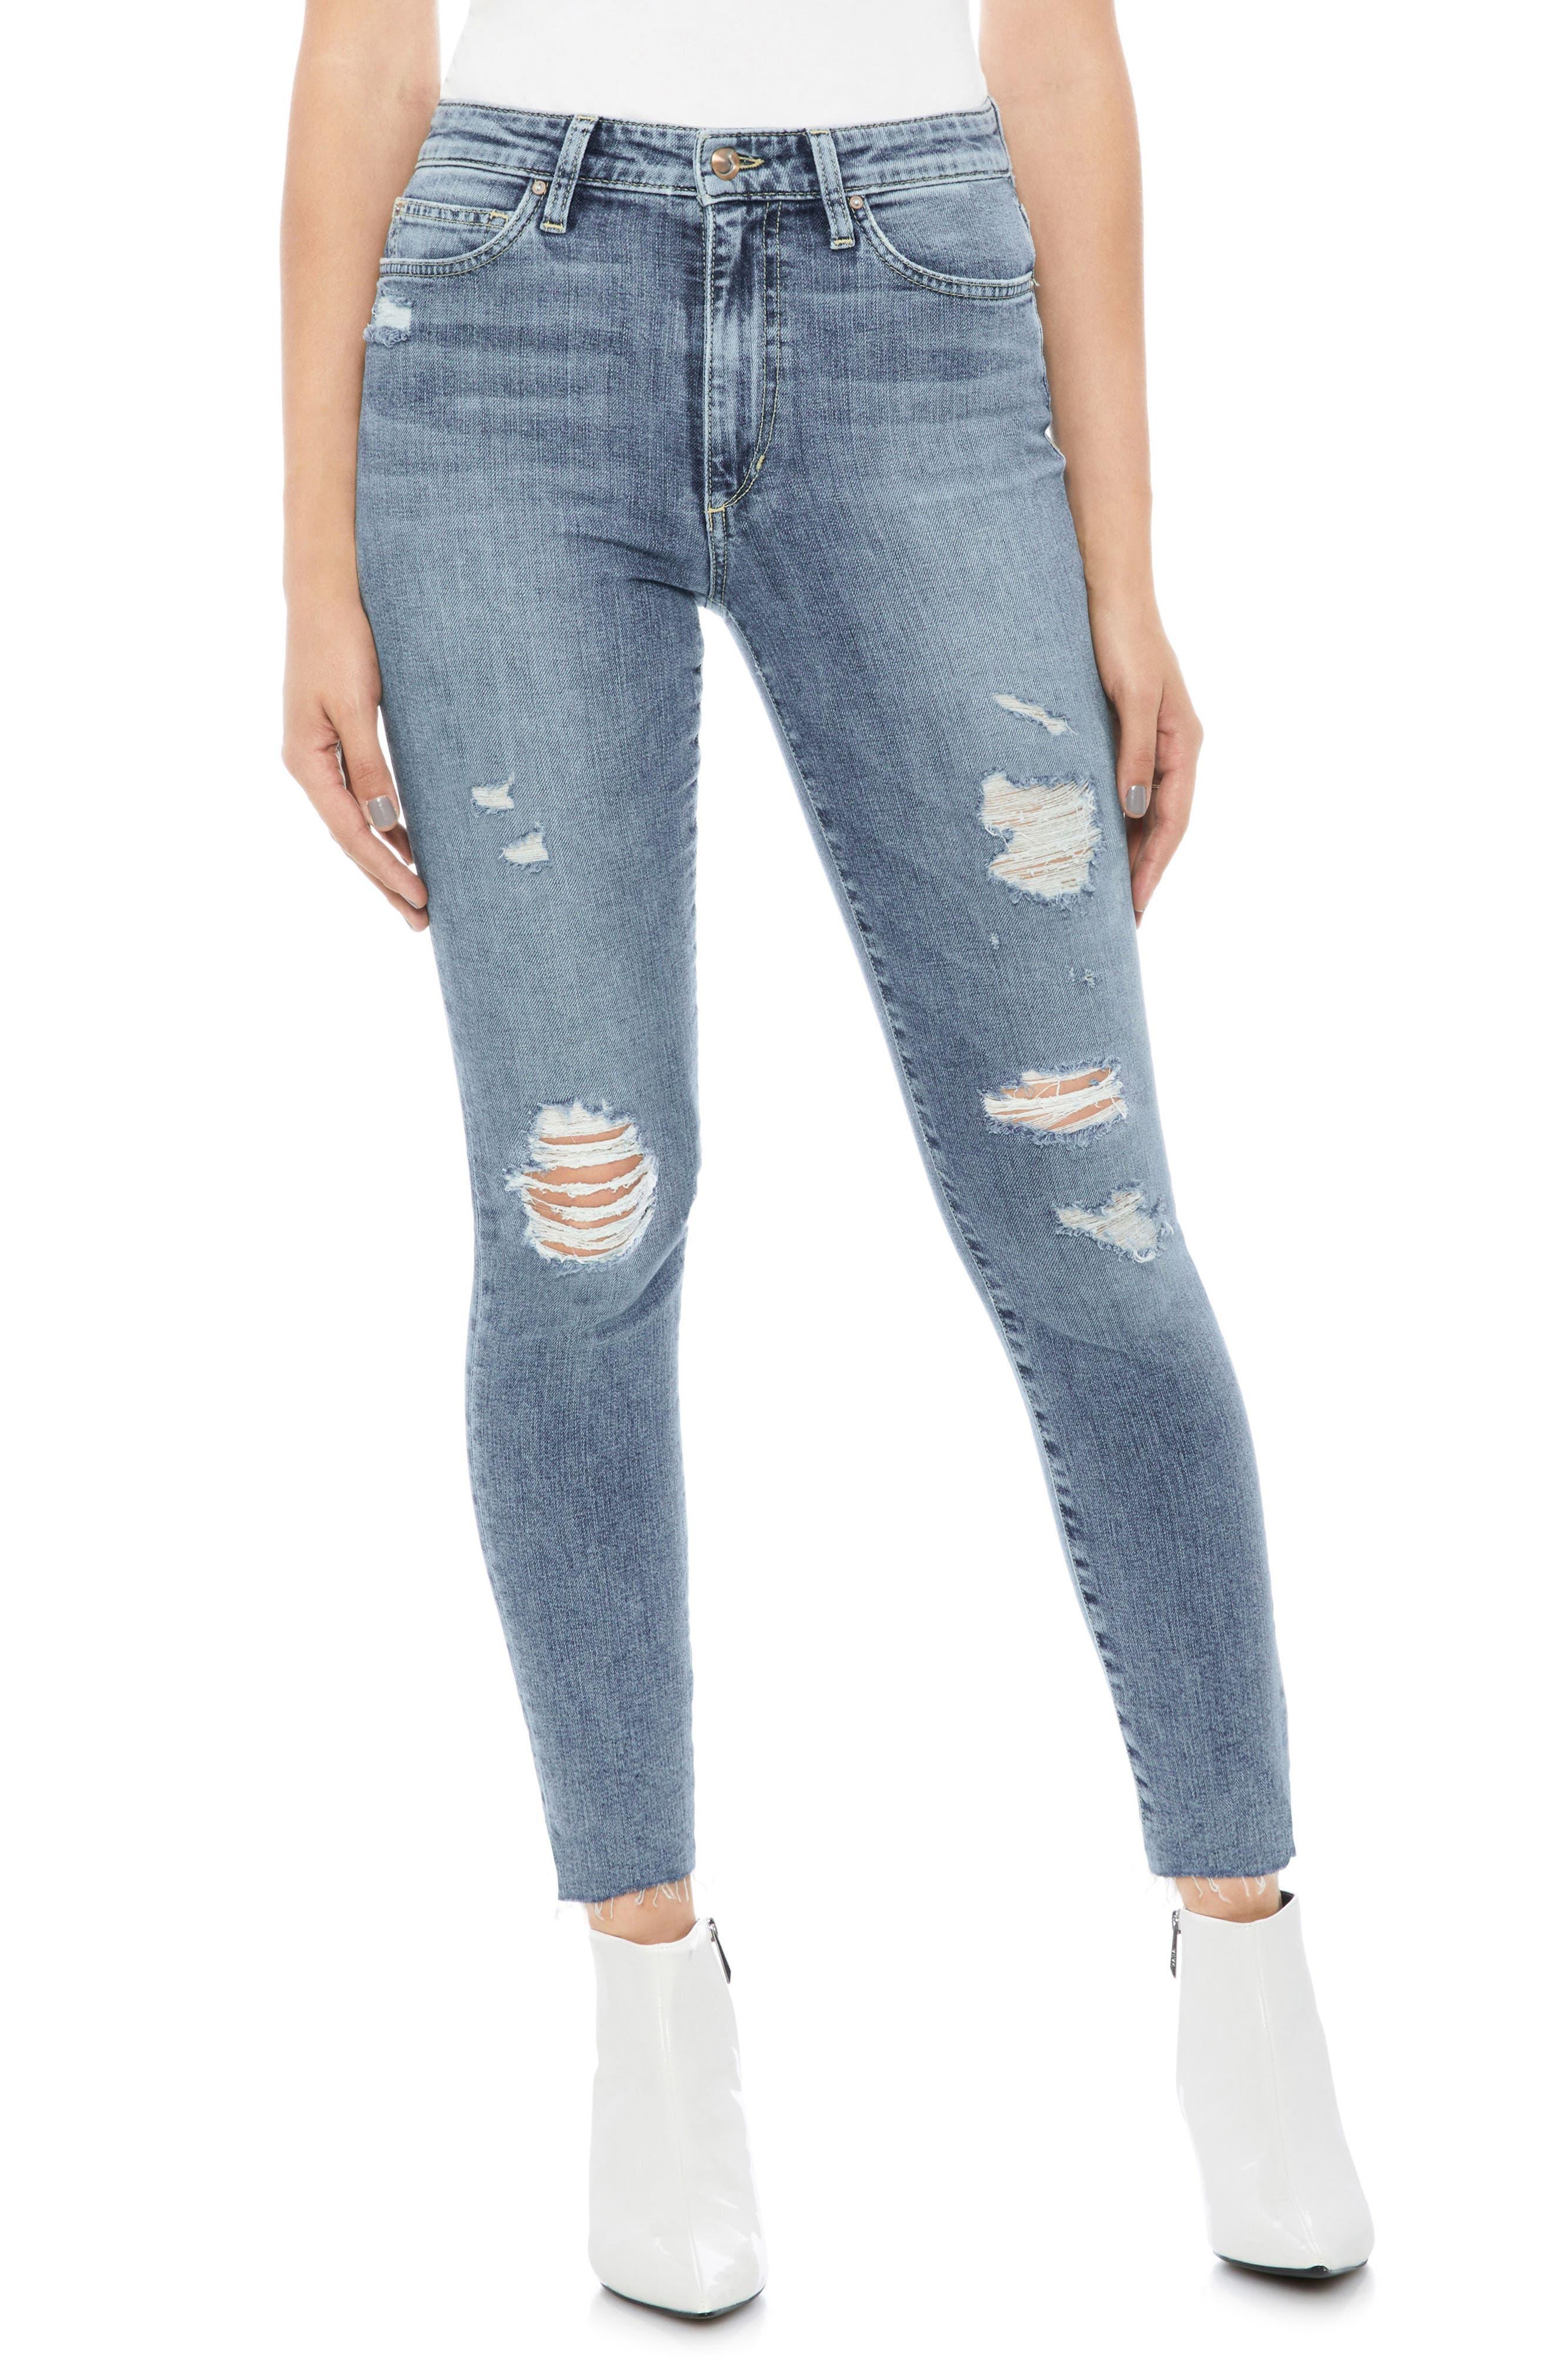 JOE'S Charlie Ripped High Waist Crop Skinny Jeans, Main, color, 450